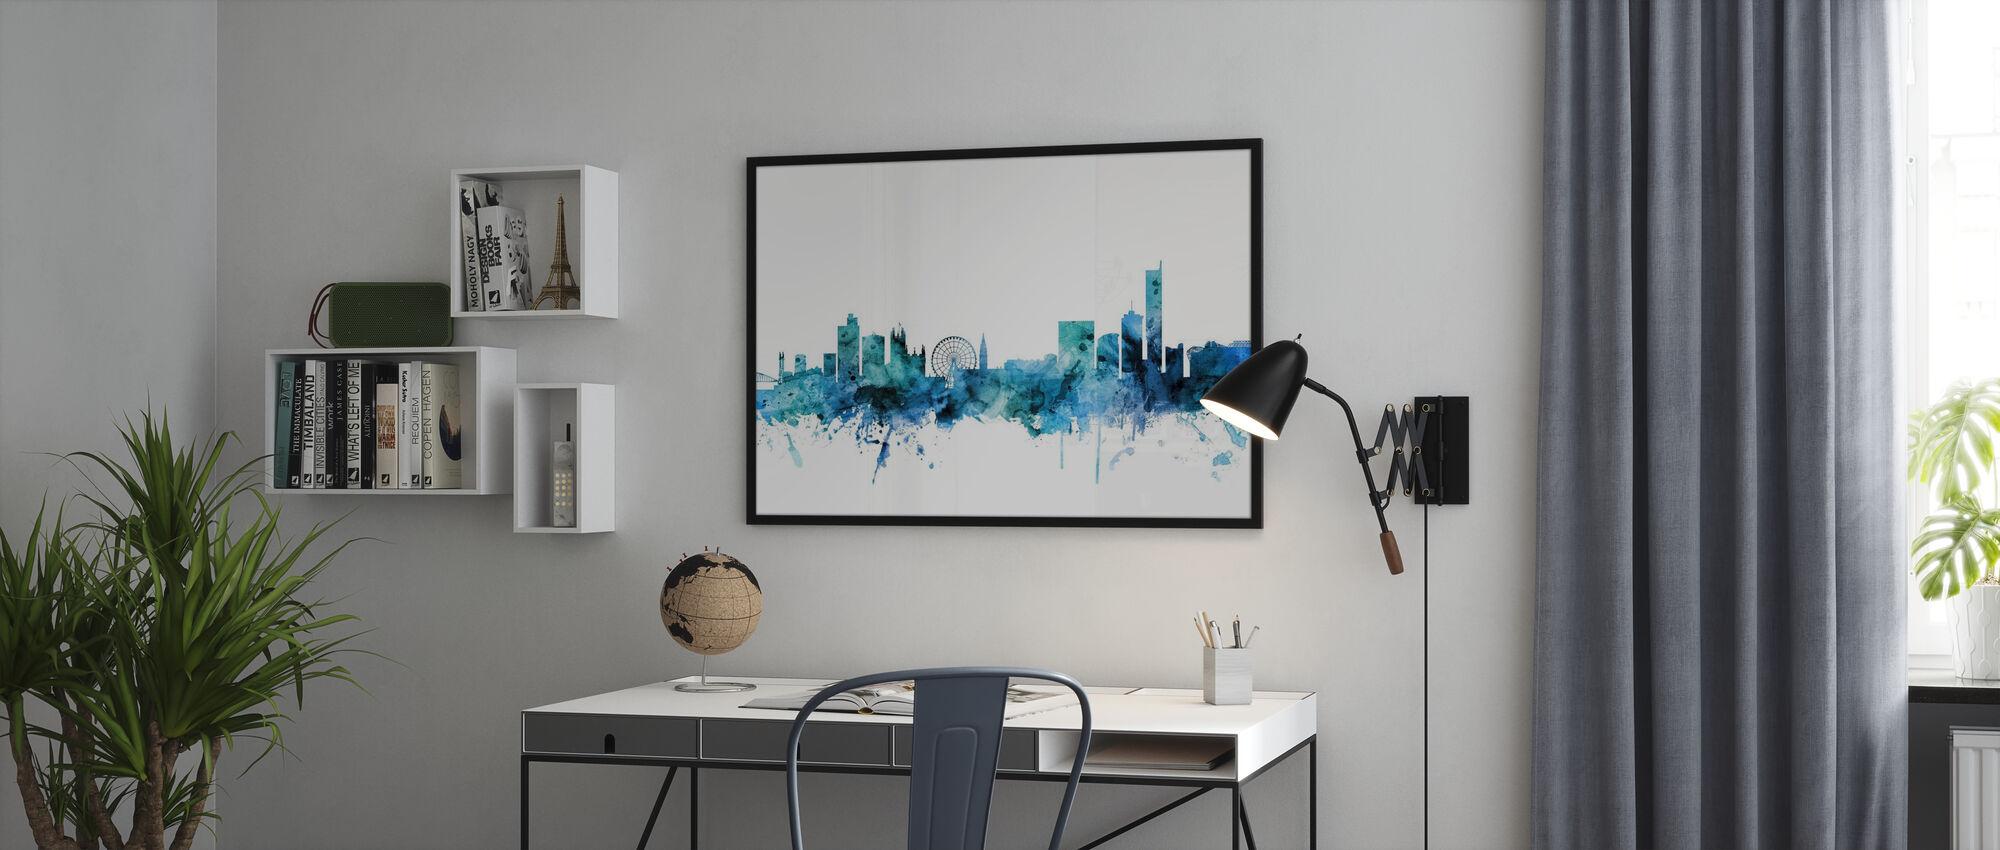 Manchester England Skyline - Poster - Office